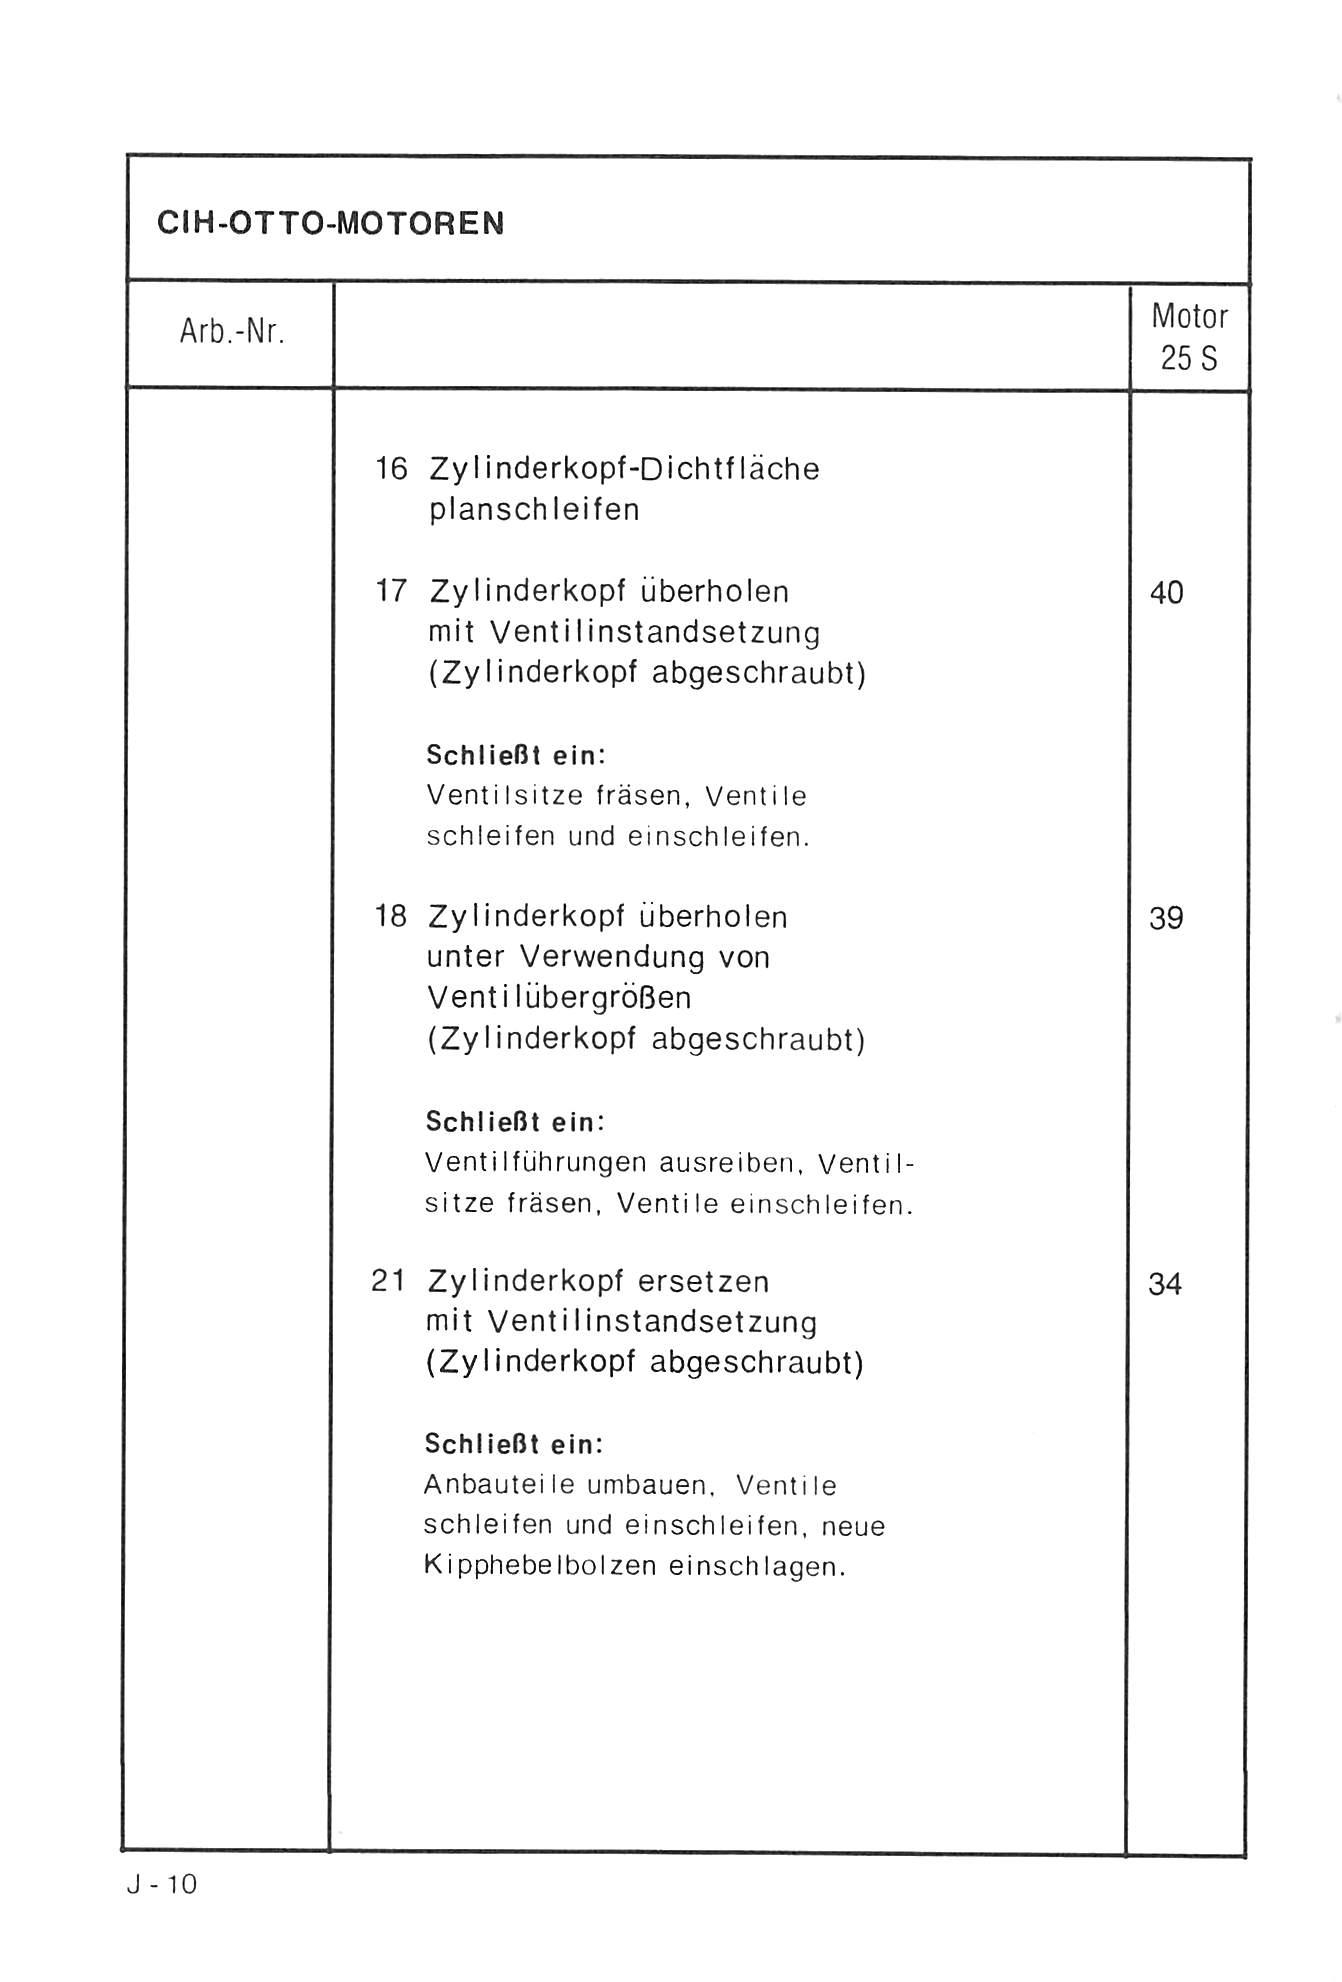 Großartig Bodenrahmenplan Galerie - Benutzerdefinierte Bilderrahmen ...